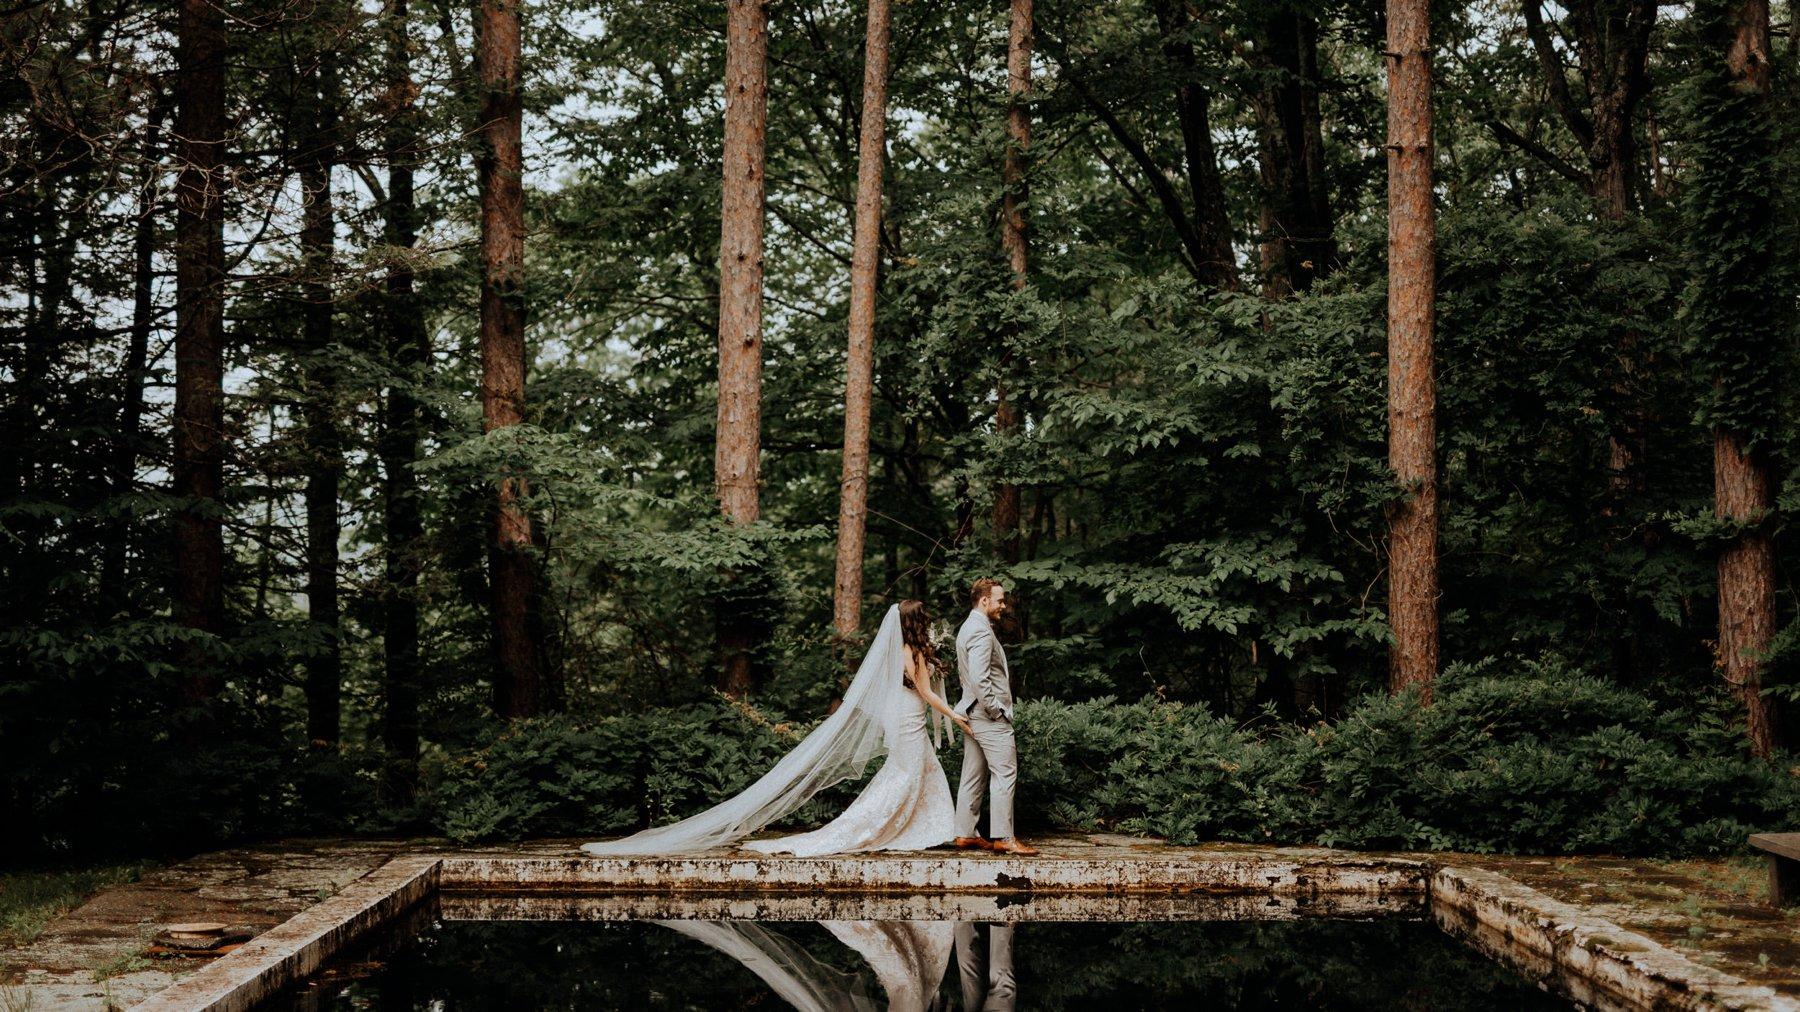 043-016-Onteora-Mountain-House-wedding-photographer-44.jpg